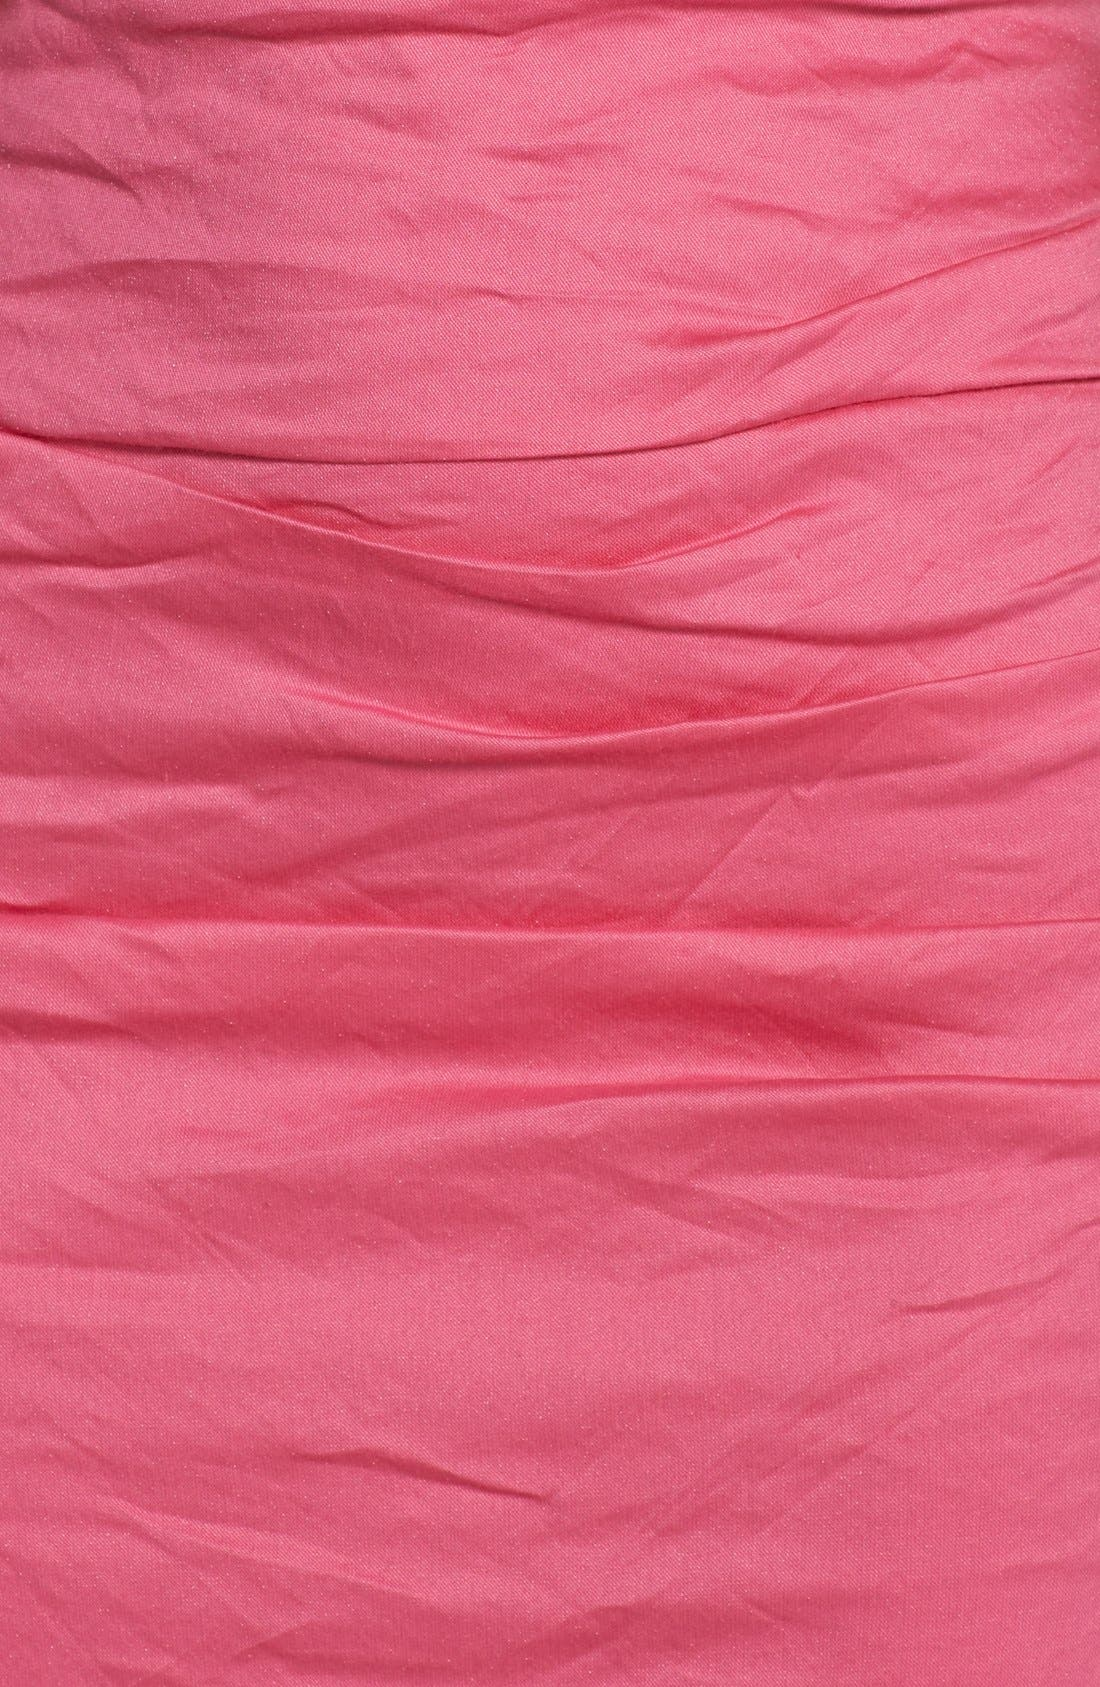 Alternate Image 4  - Nicole Miller Stretch Cotton Sheath Dress